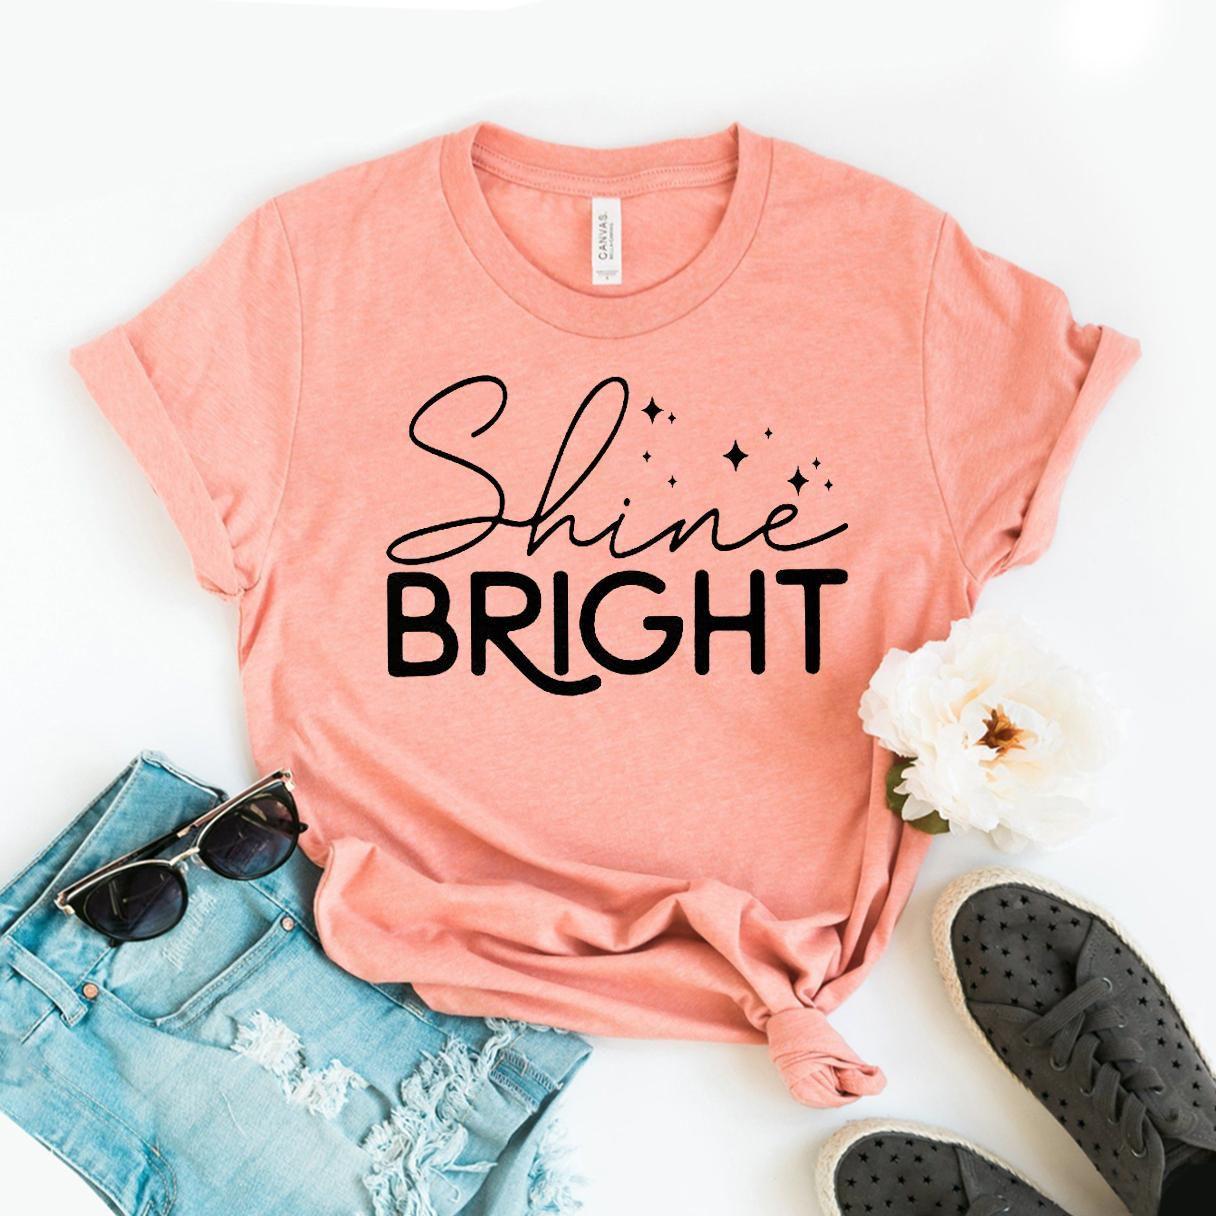 Shine Bright T-shirt, Positive Quote Shirt, Counselor Shirts, Motivational Top, Women's Sunshine Tee, Inspirational Size X-Large